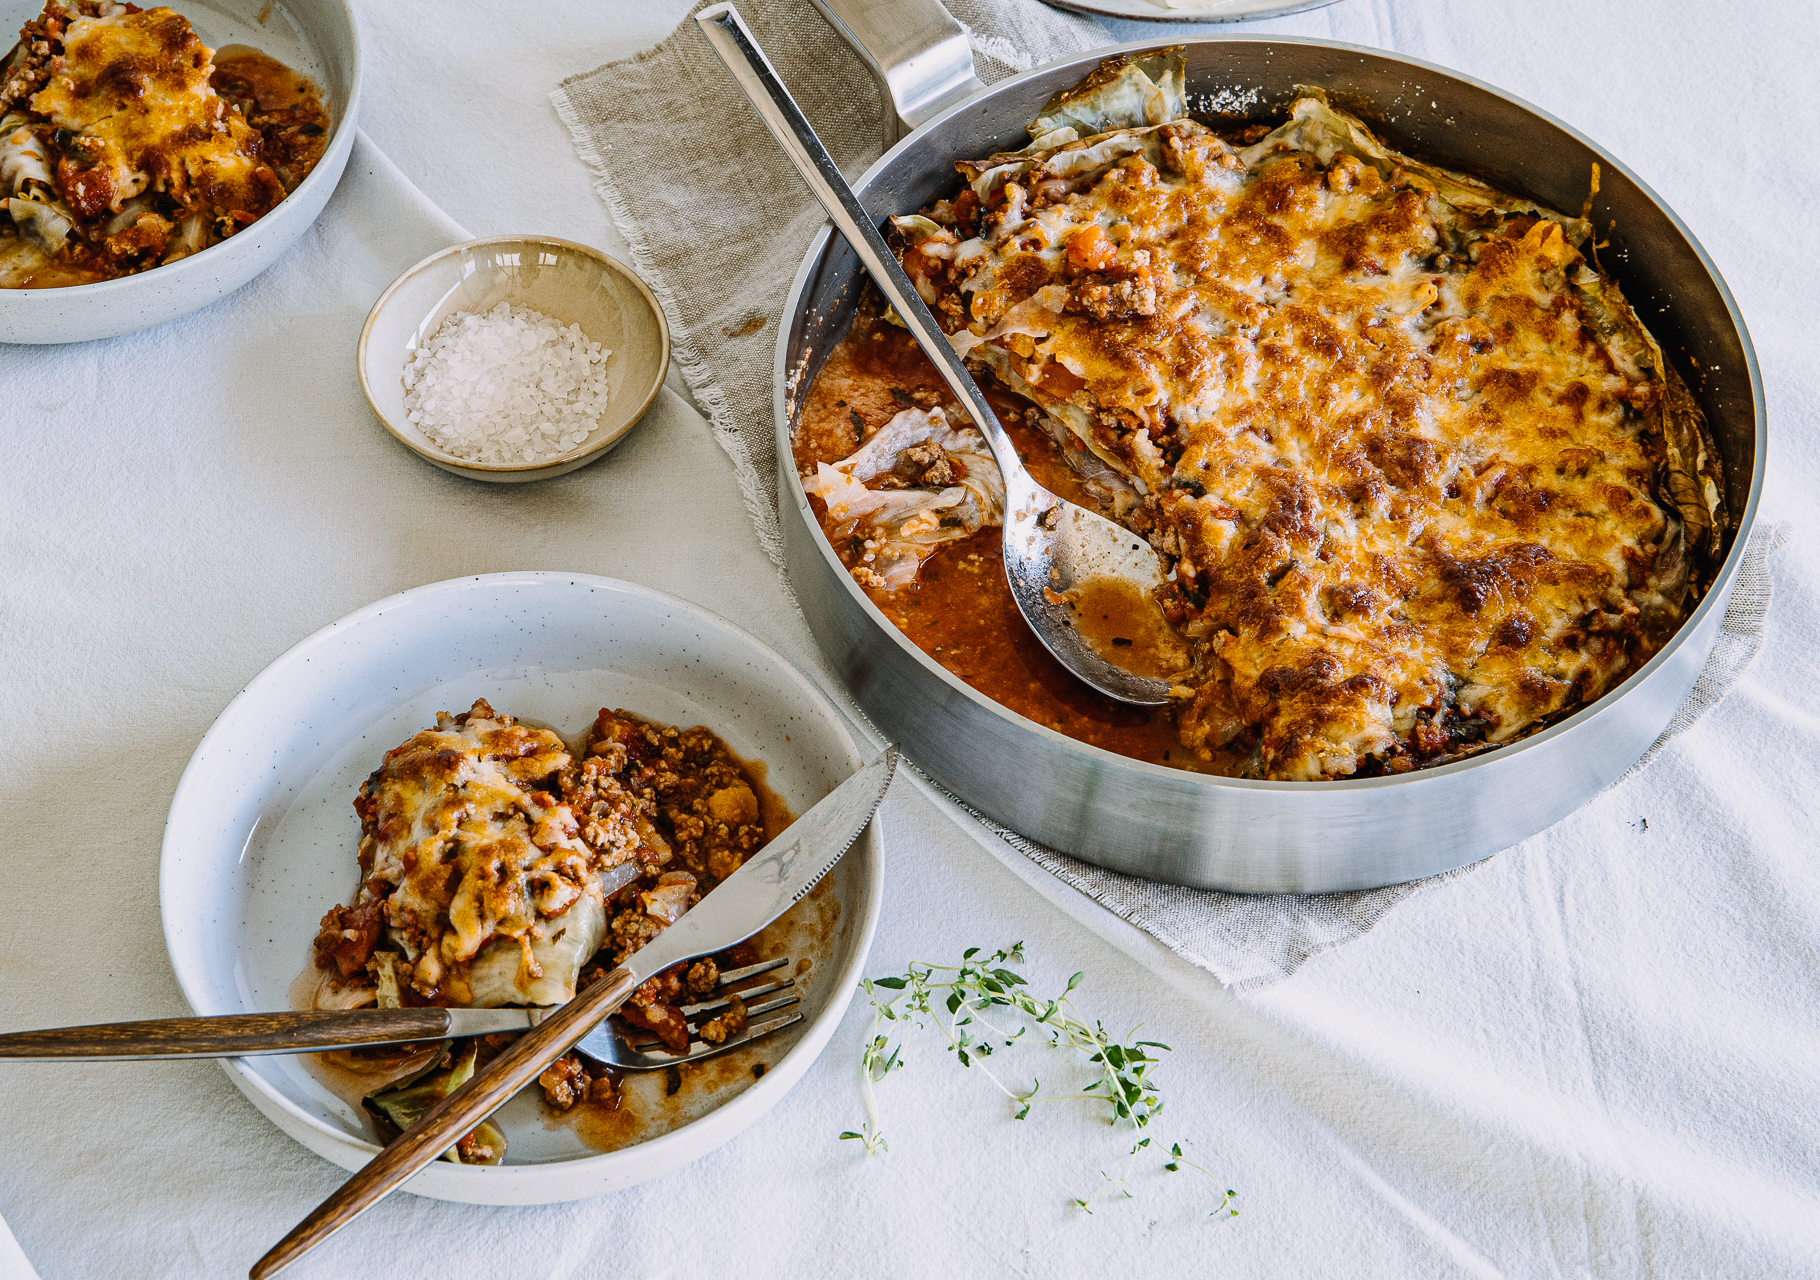 Spitzkohl-Lasagne mit Hackfleisch, Tomaten & Mozzarella - Low Carb